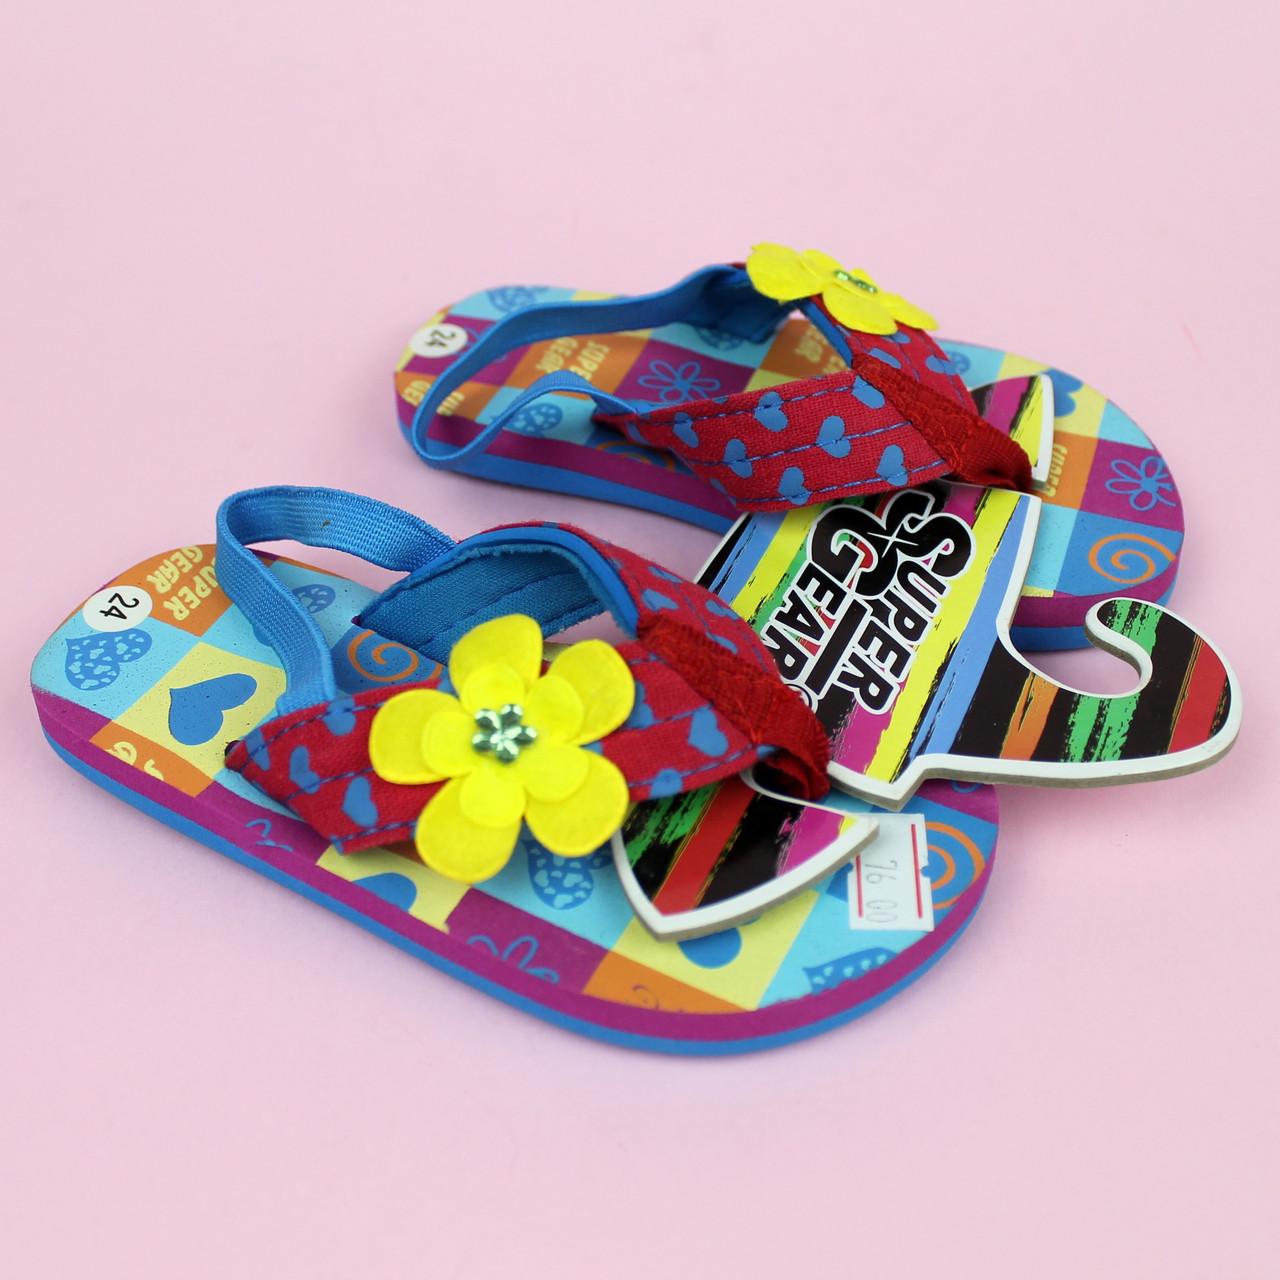 Вьетнамки для девочки, пляжная обувь тм Super Gear р.22,24